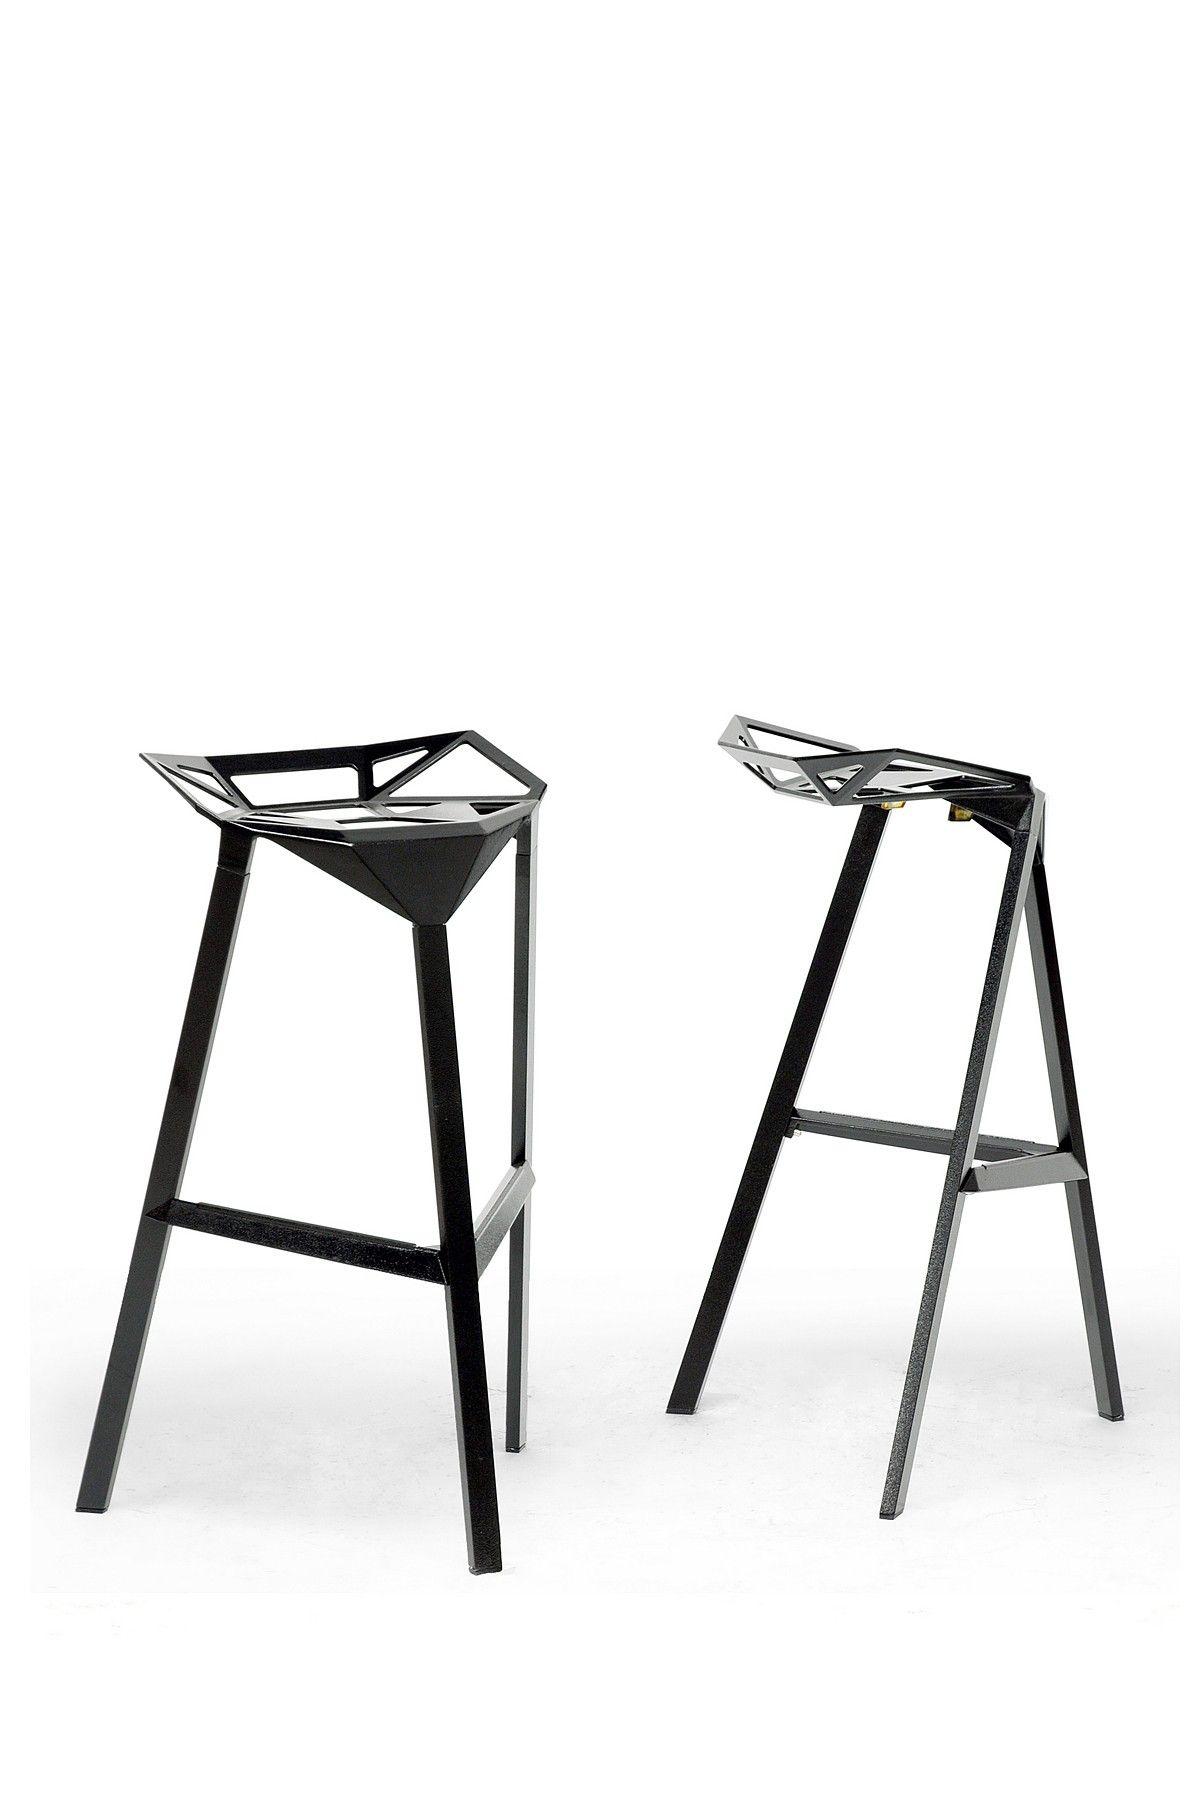 W I Modern Furniture Black Kaysa Aluminum Modern Bar Stool